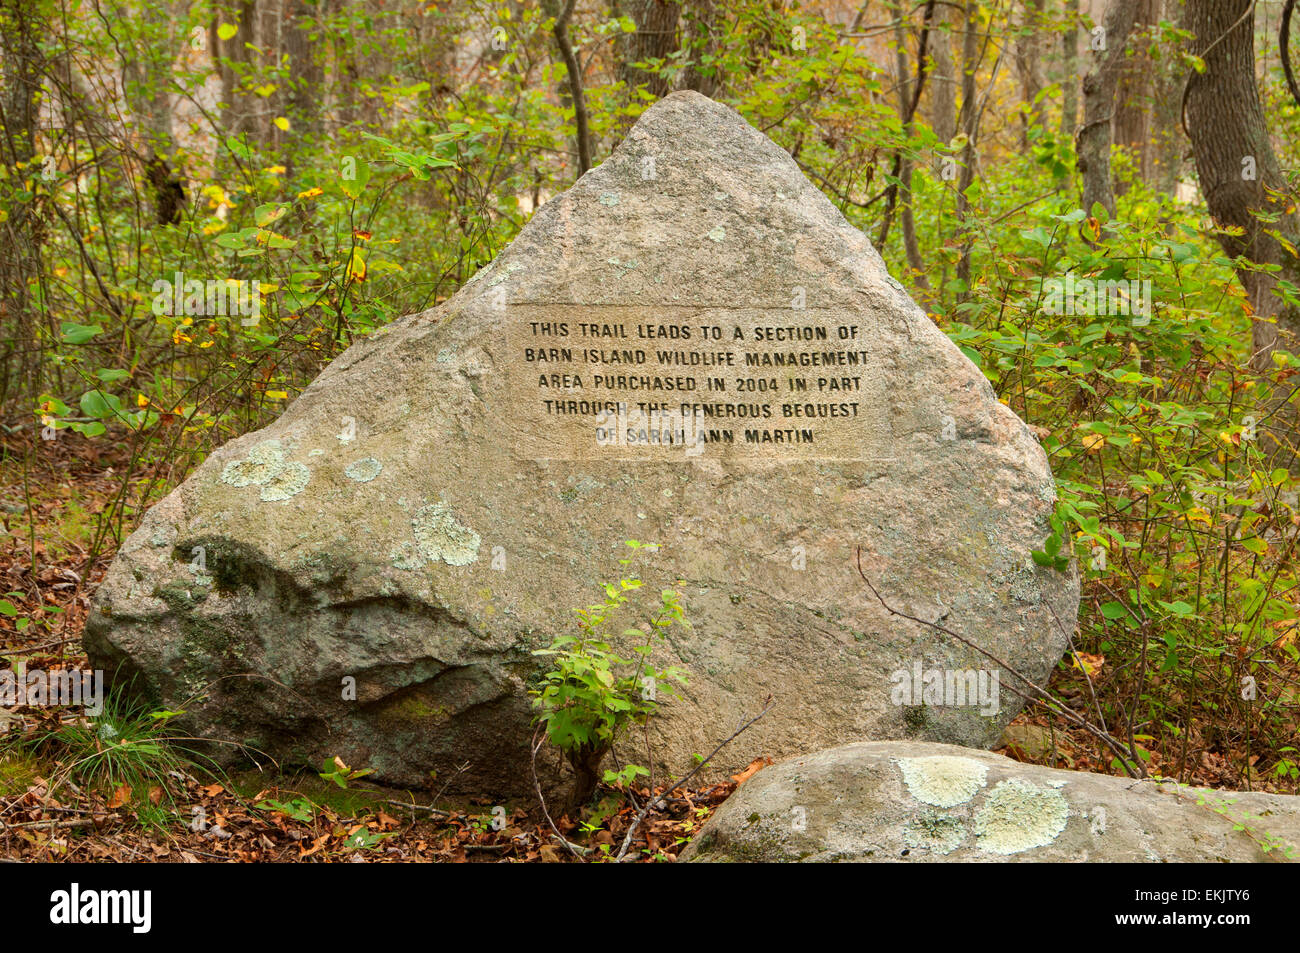 Appreciation monument, Barn Island Wildlife Management Area, Connecticut - Stock Image